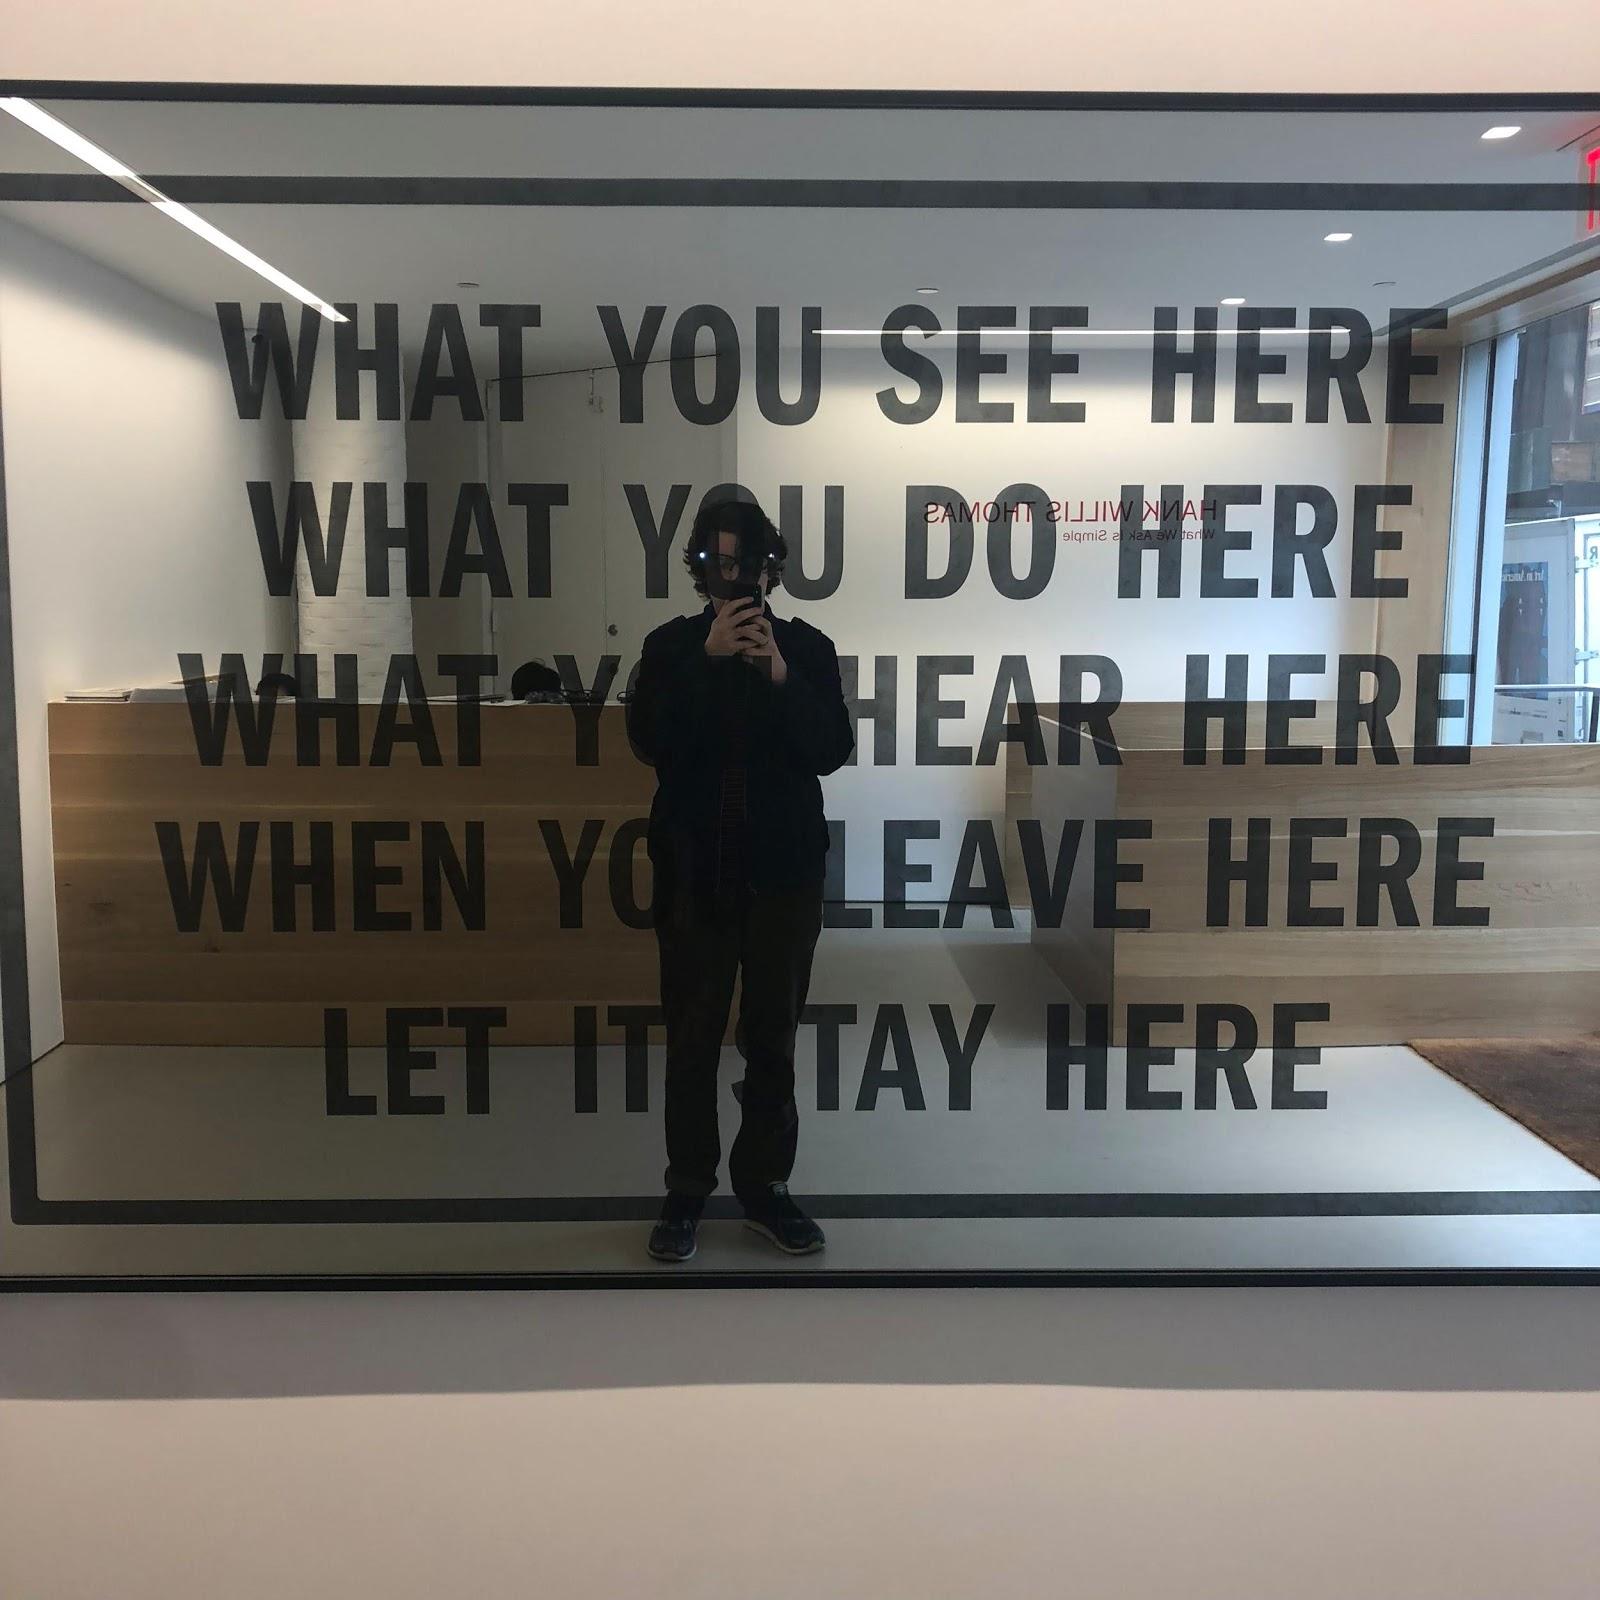 """What You See Here/What You Do Here/What You Hear Here/What You Leave Here/Let it Stay Here, 2018"